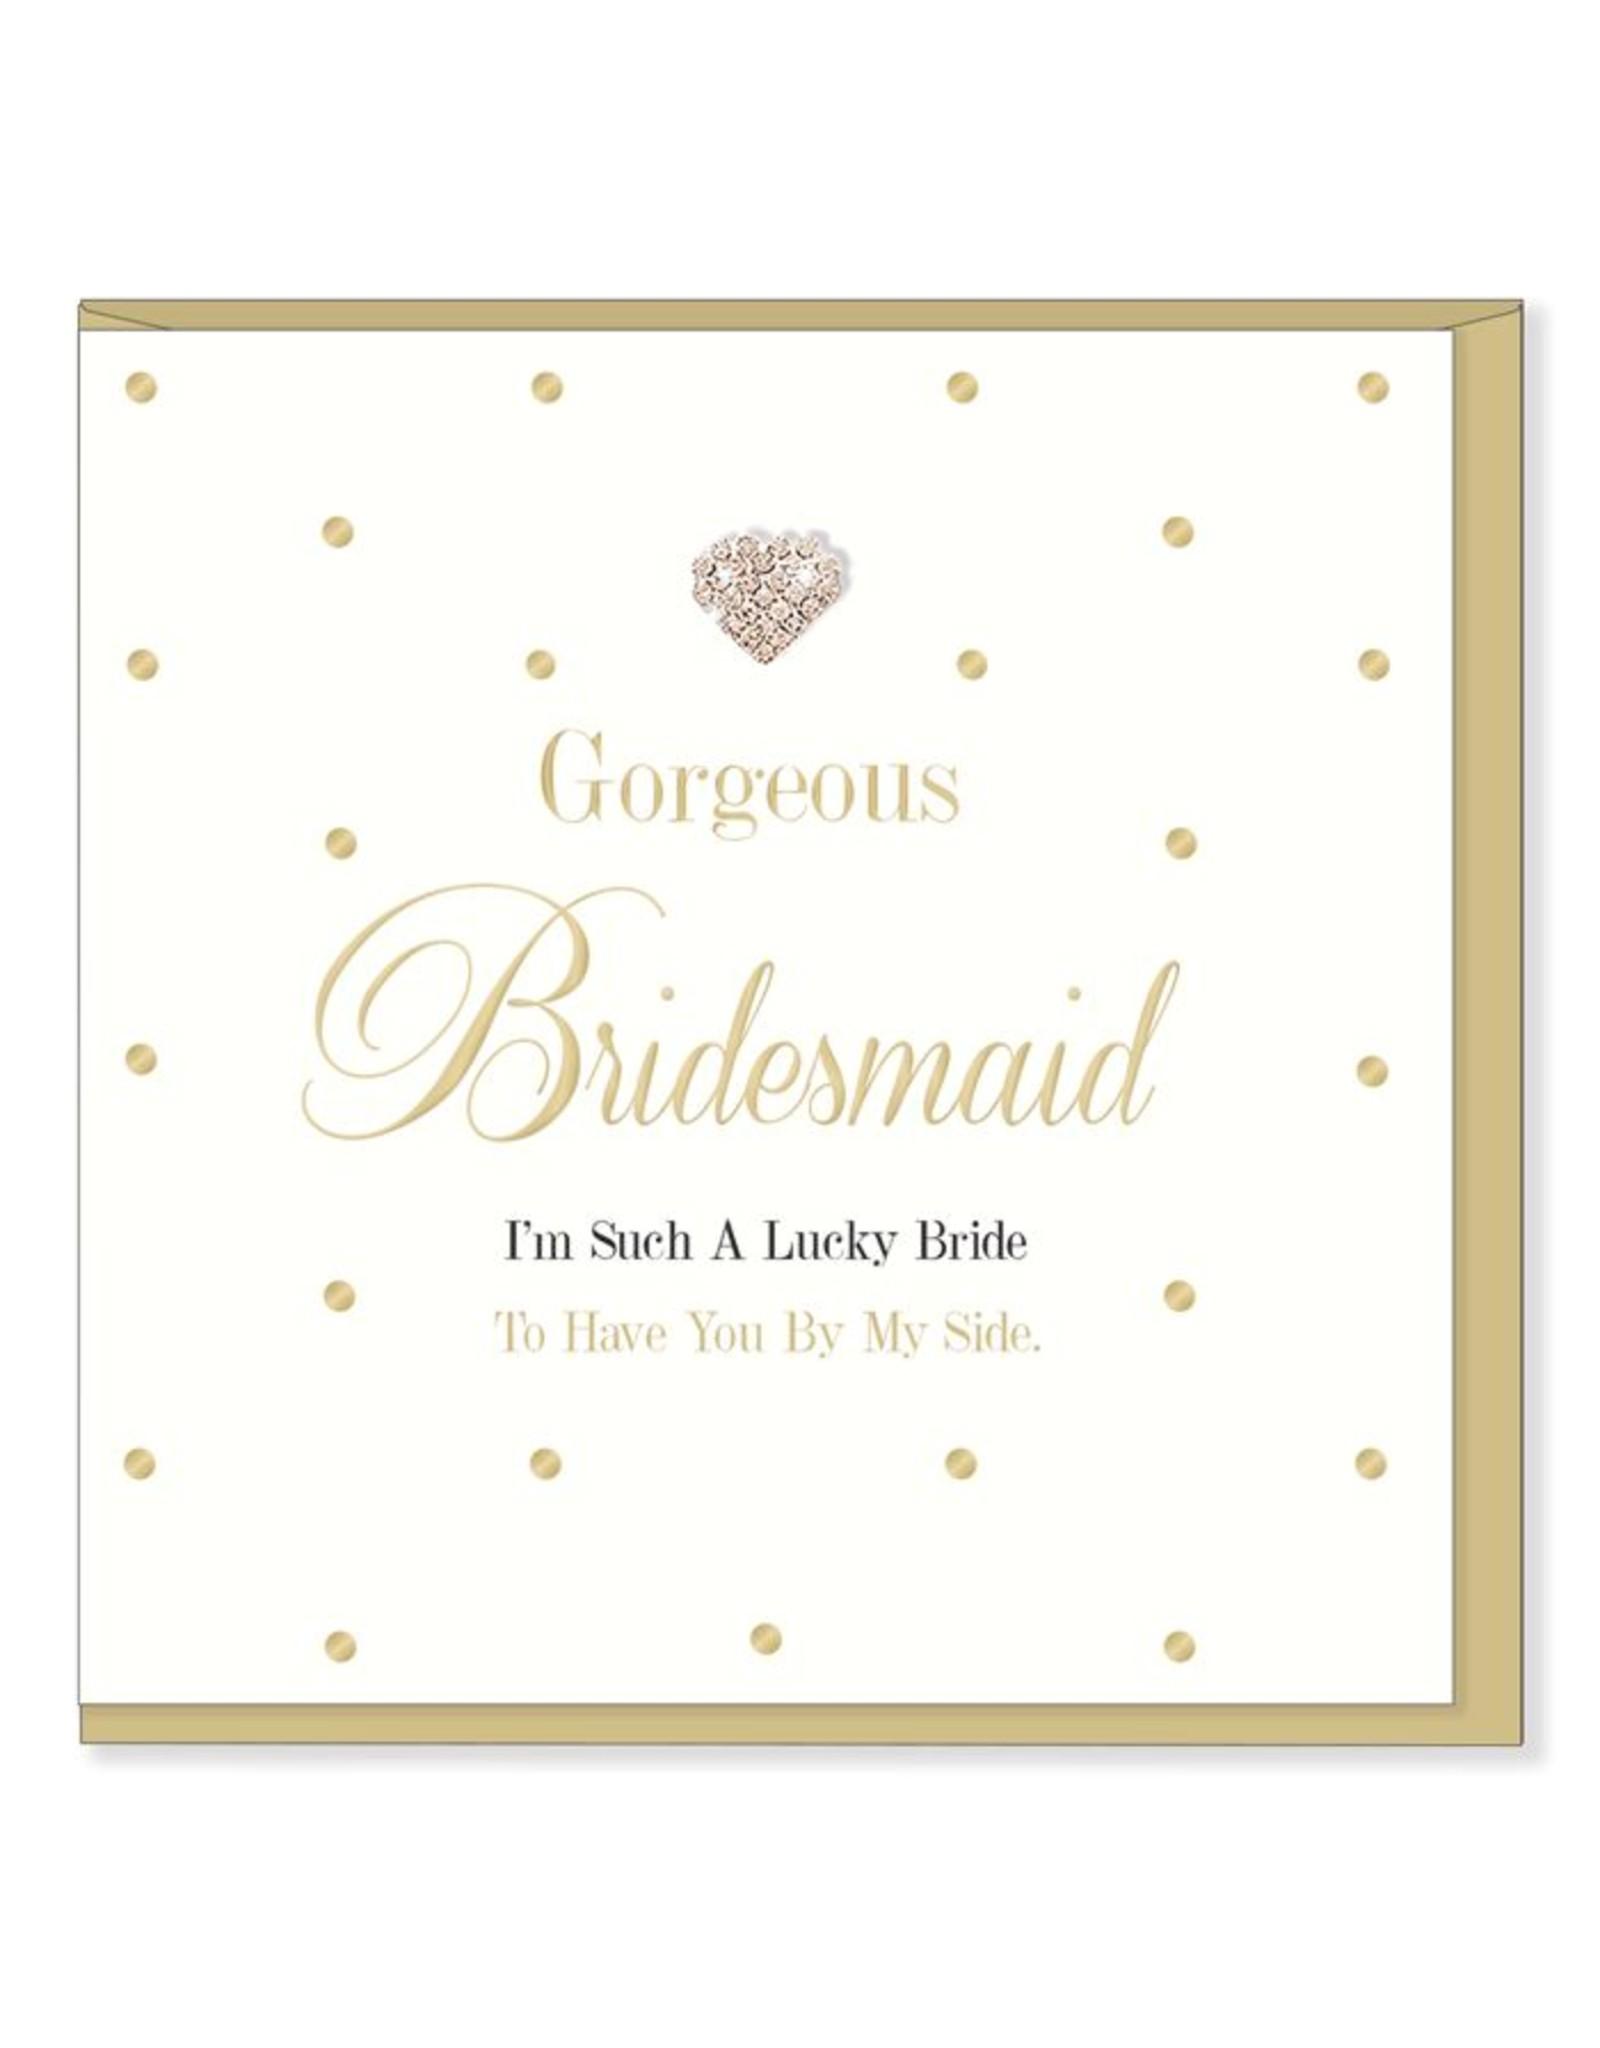 Hearts Design Wenskaart - Gorgeous Bridesmaid